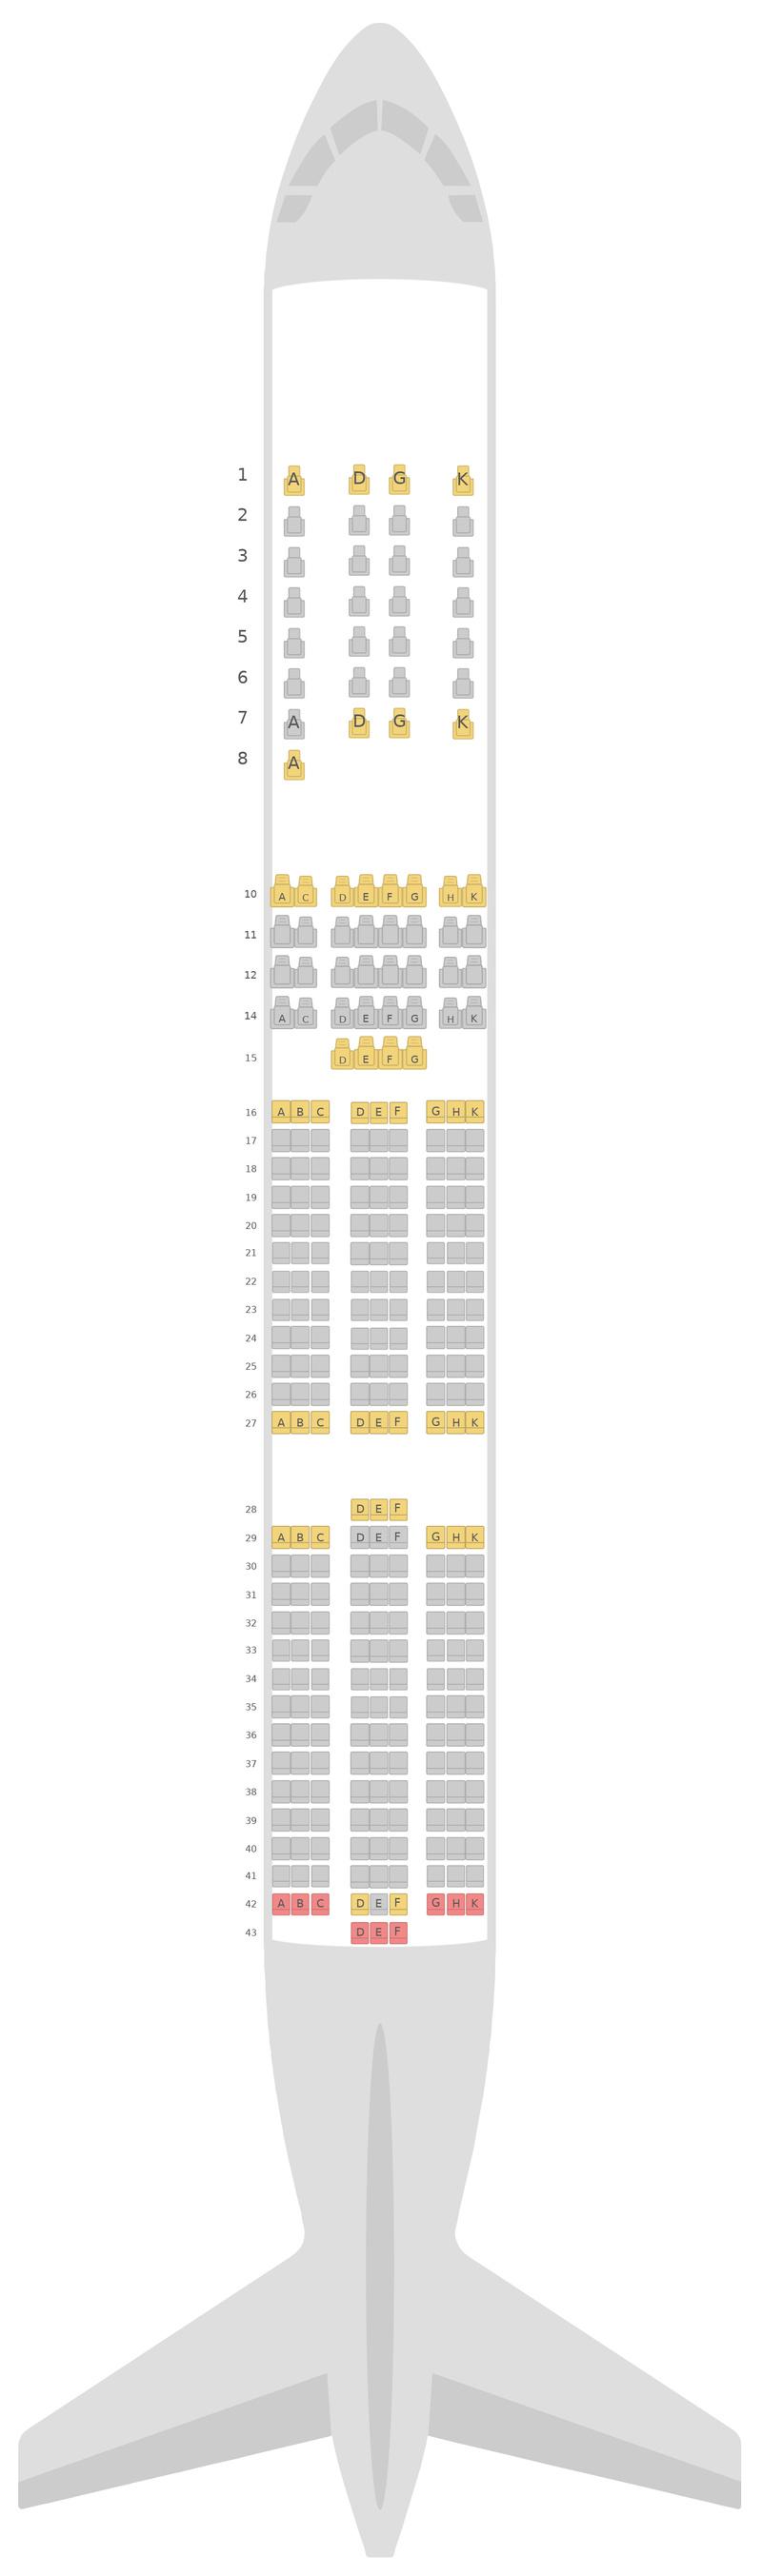 Sitzplan Airbus A350-900 (359) v2 Vietnam Airlines